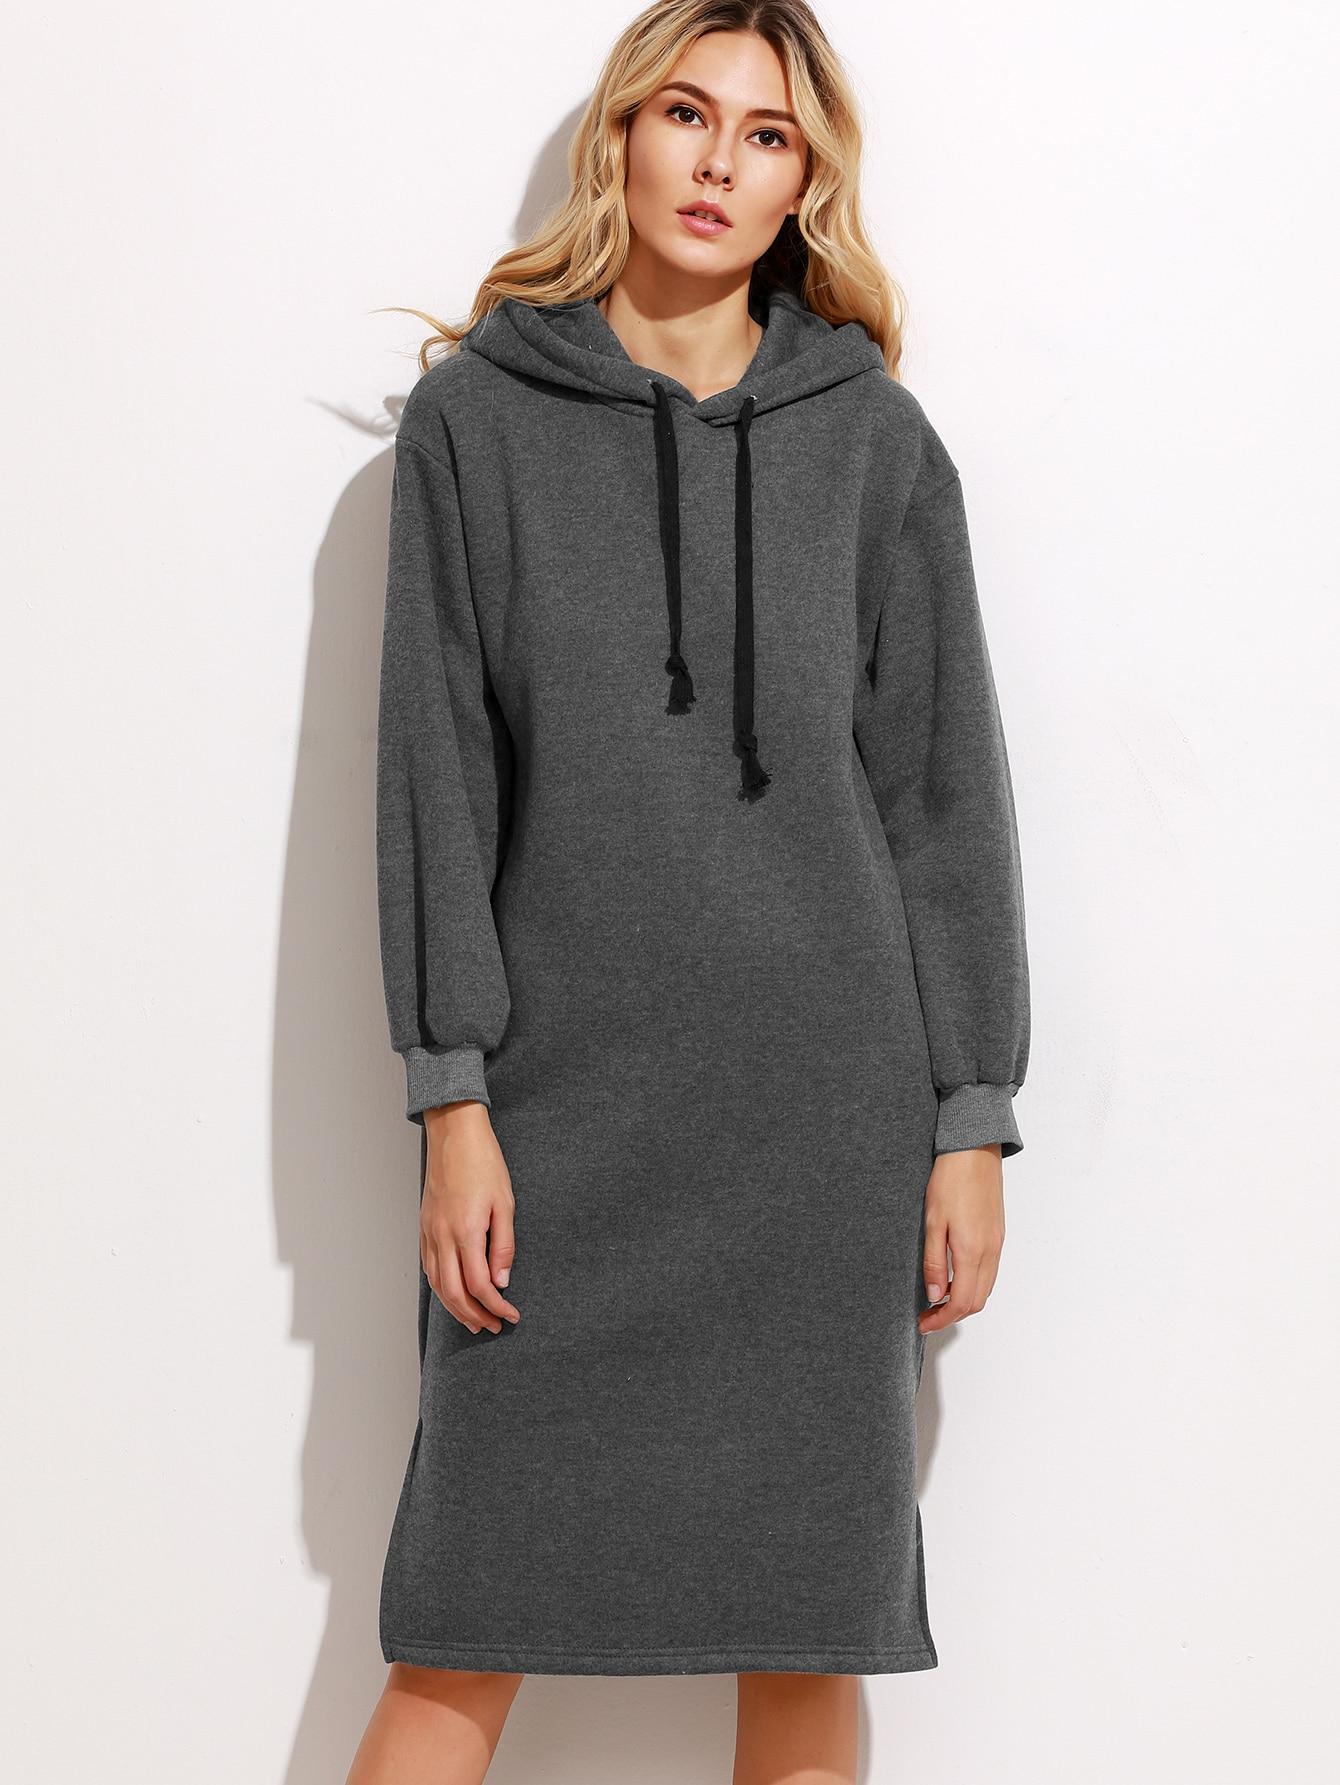 robe sweat shirt fendu avec capuche gris fonc french romwe. Black Bedroom Furniture Sets. Home Design Ideas